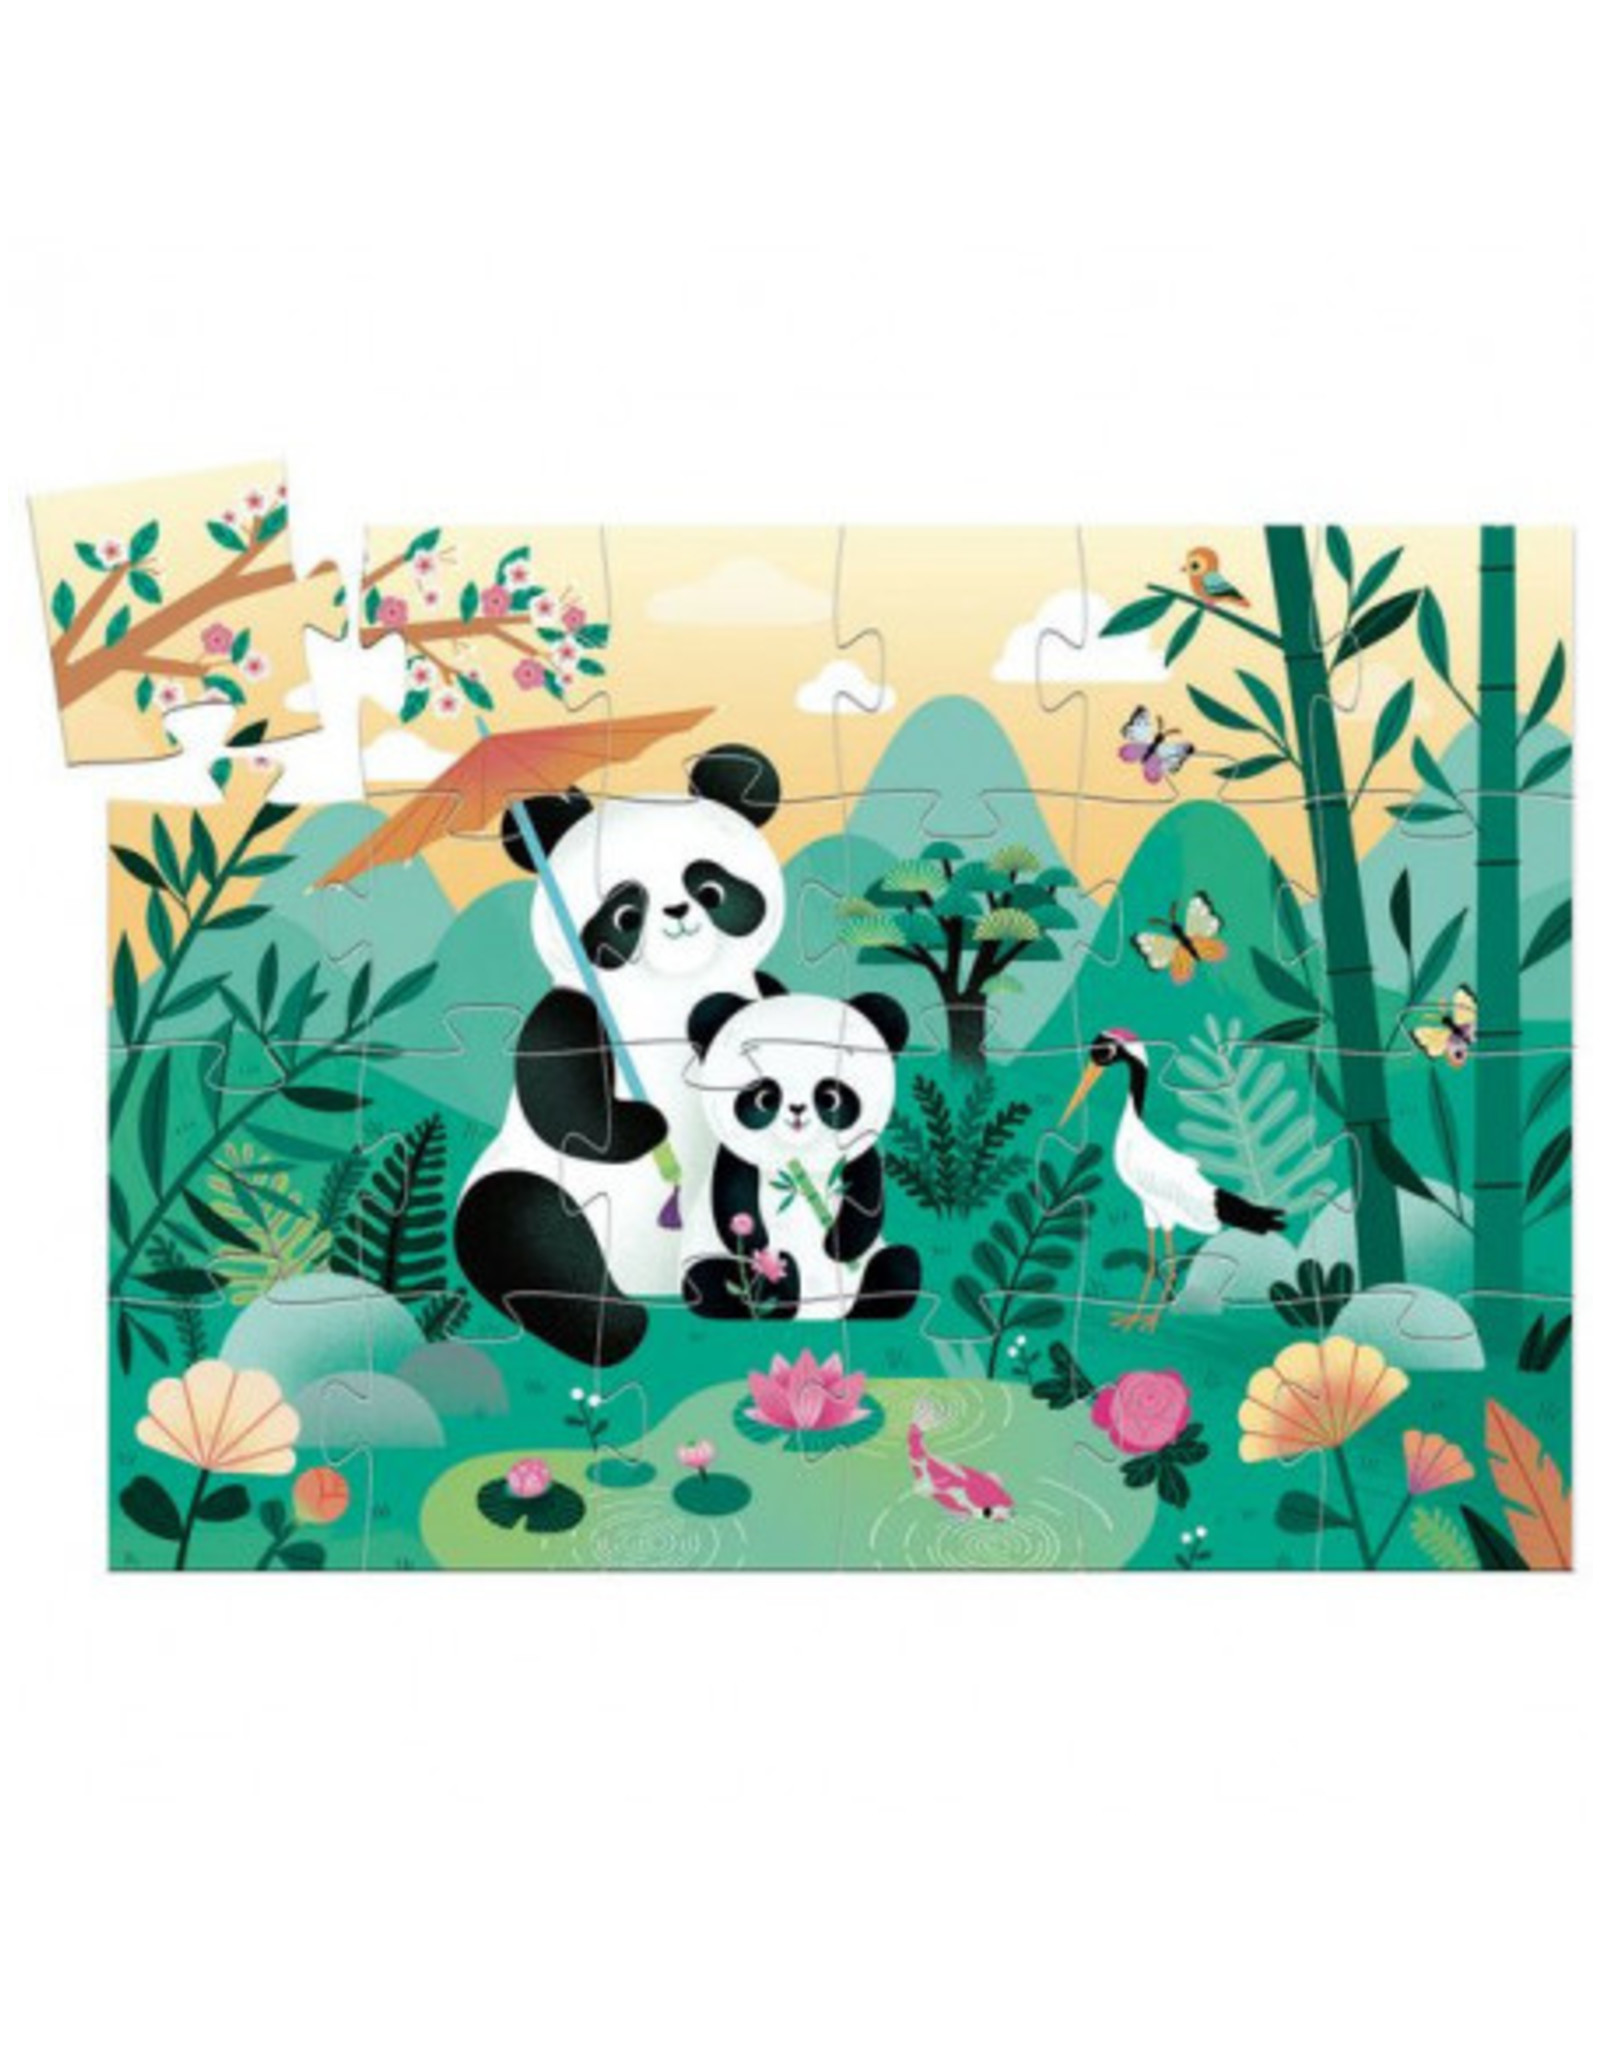 Djeco Leo the Panda Silhouette Puzzle